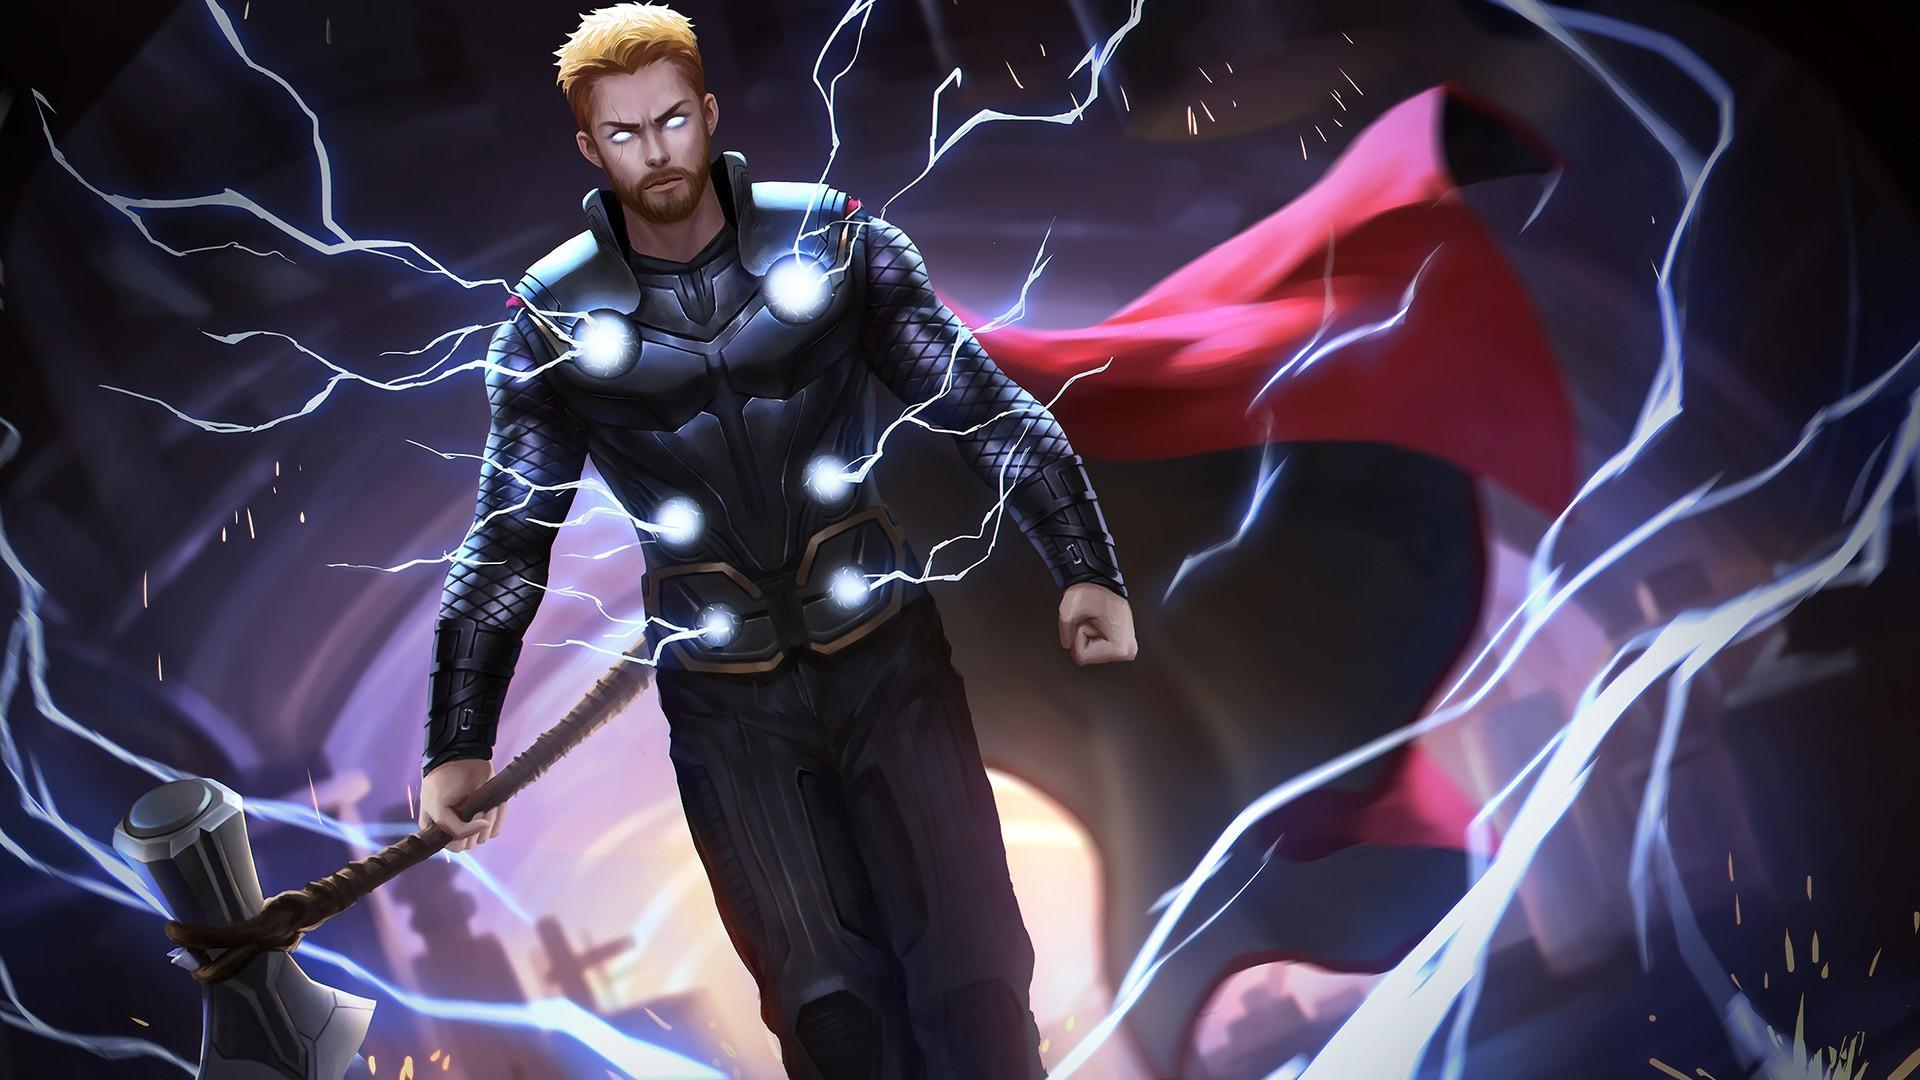 Thor Stormbreaker Wallpapers Wallpaper Cave